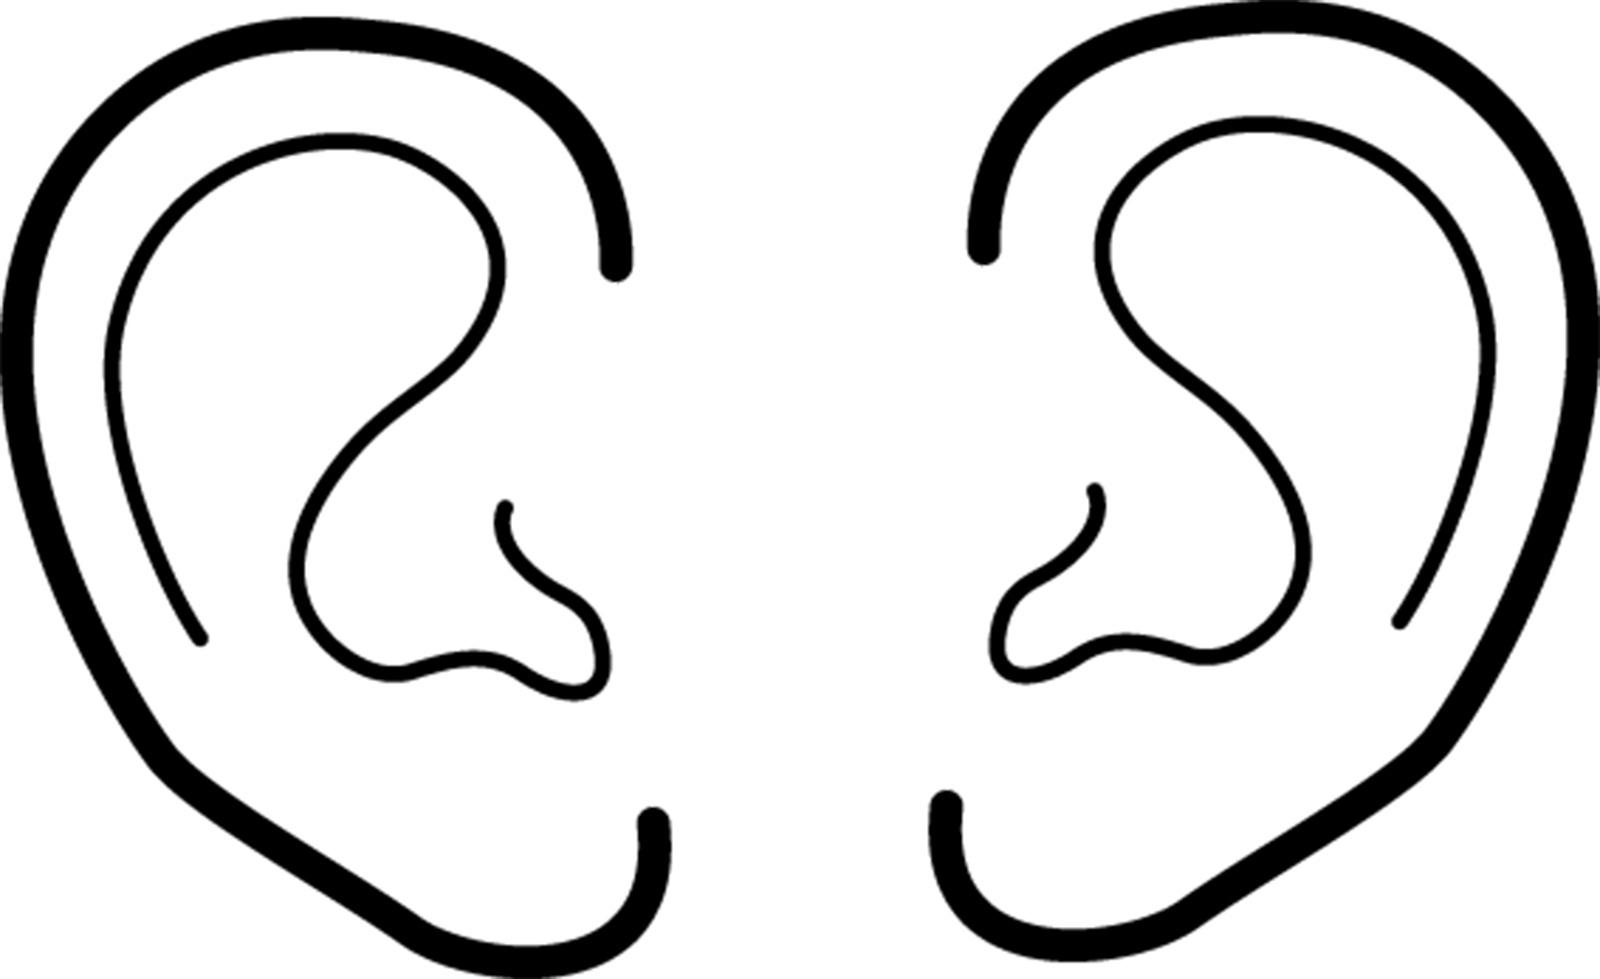 Ears clipart. Cool of ear black